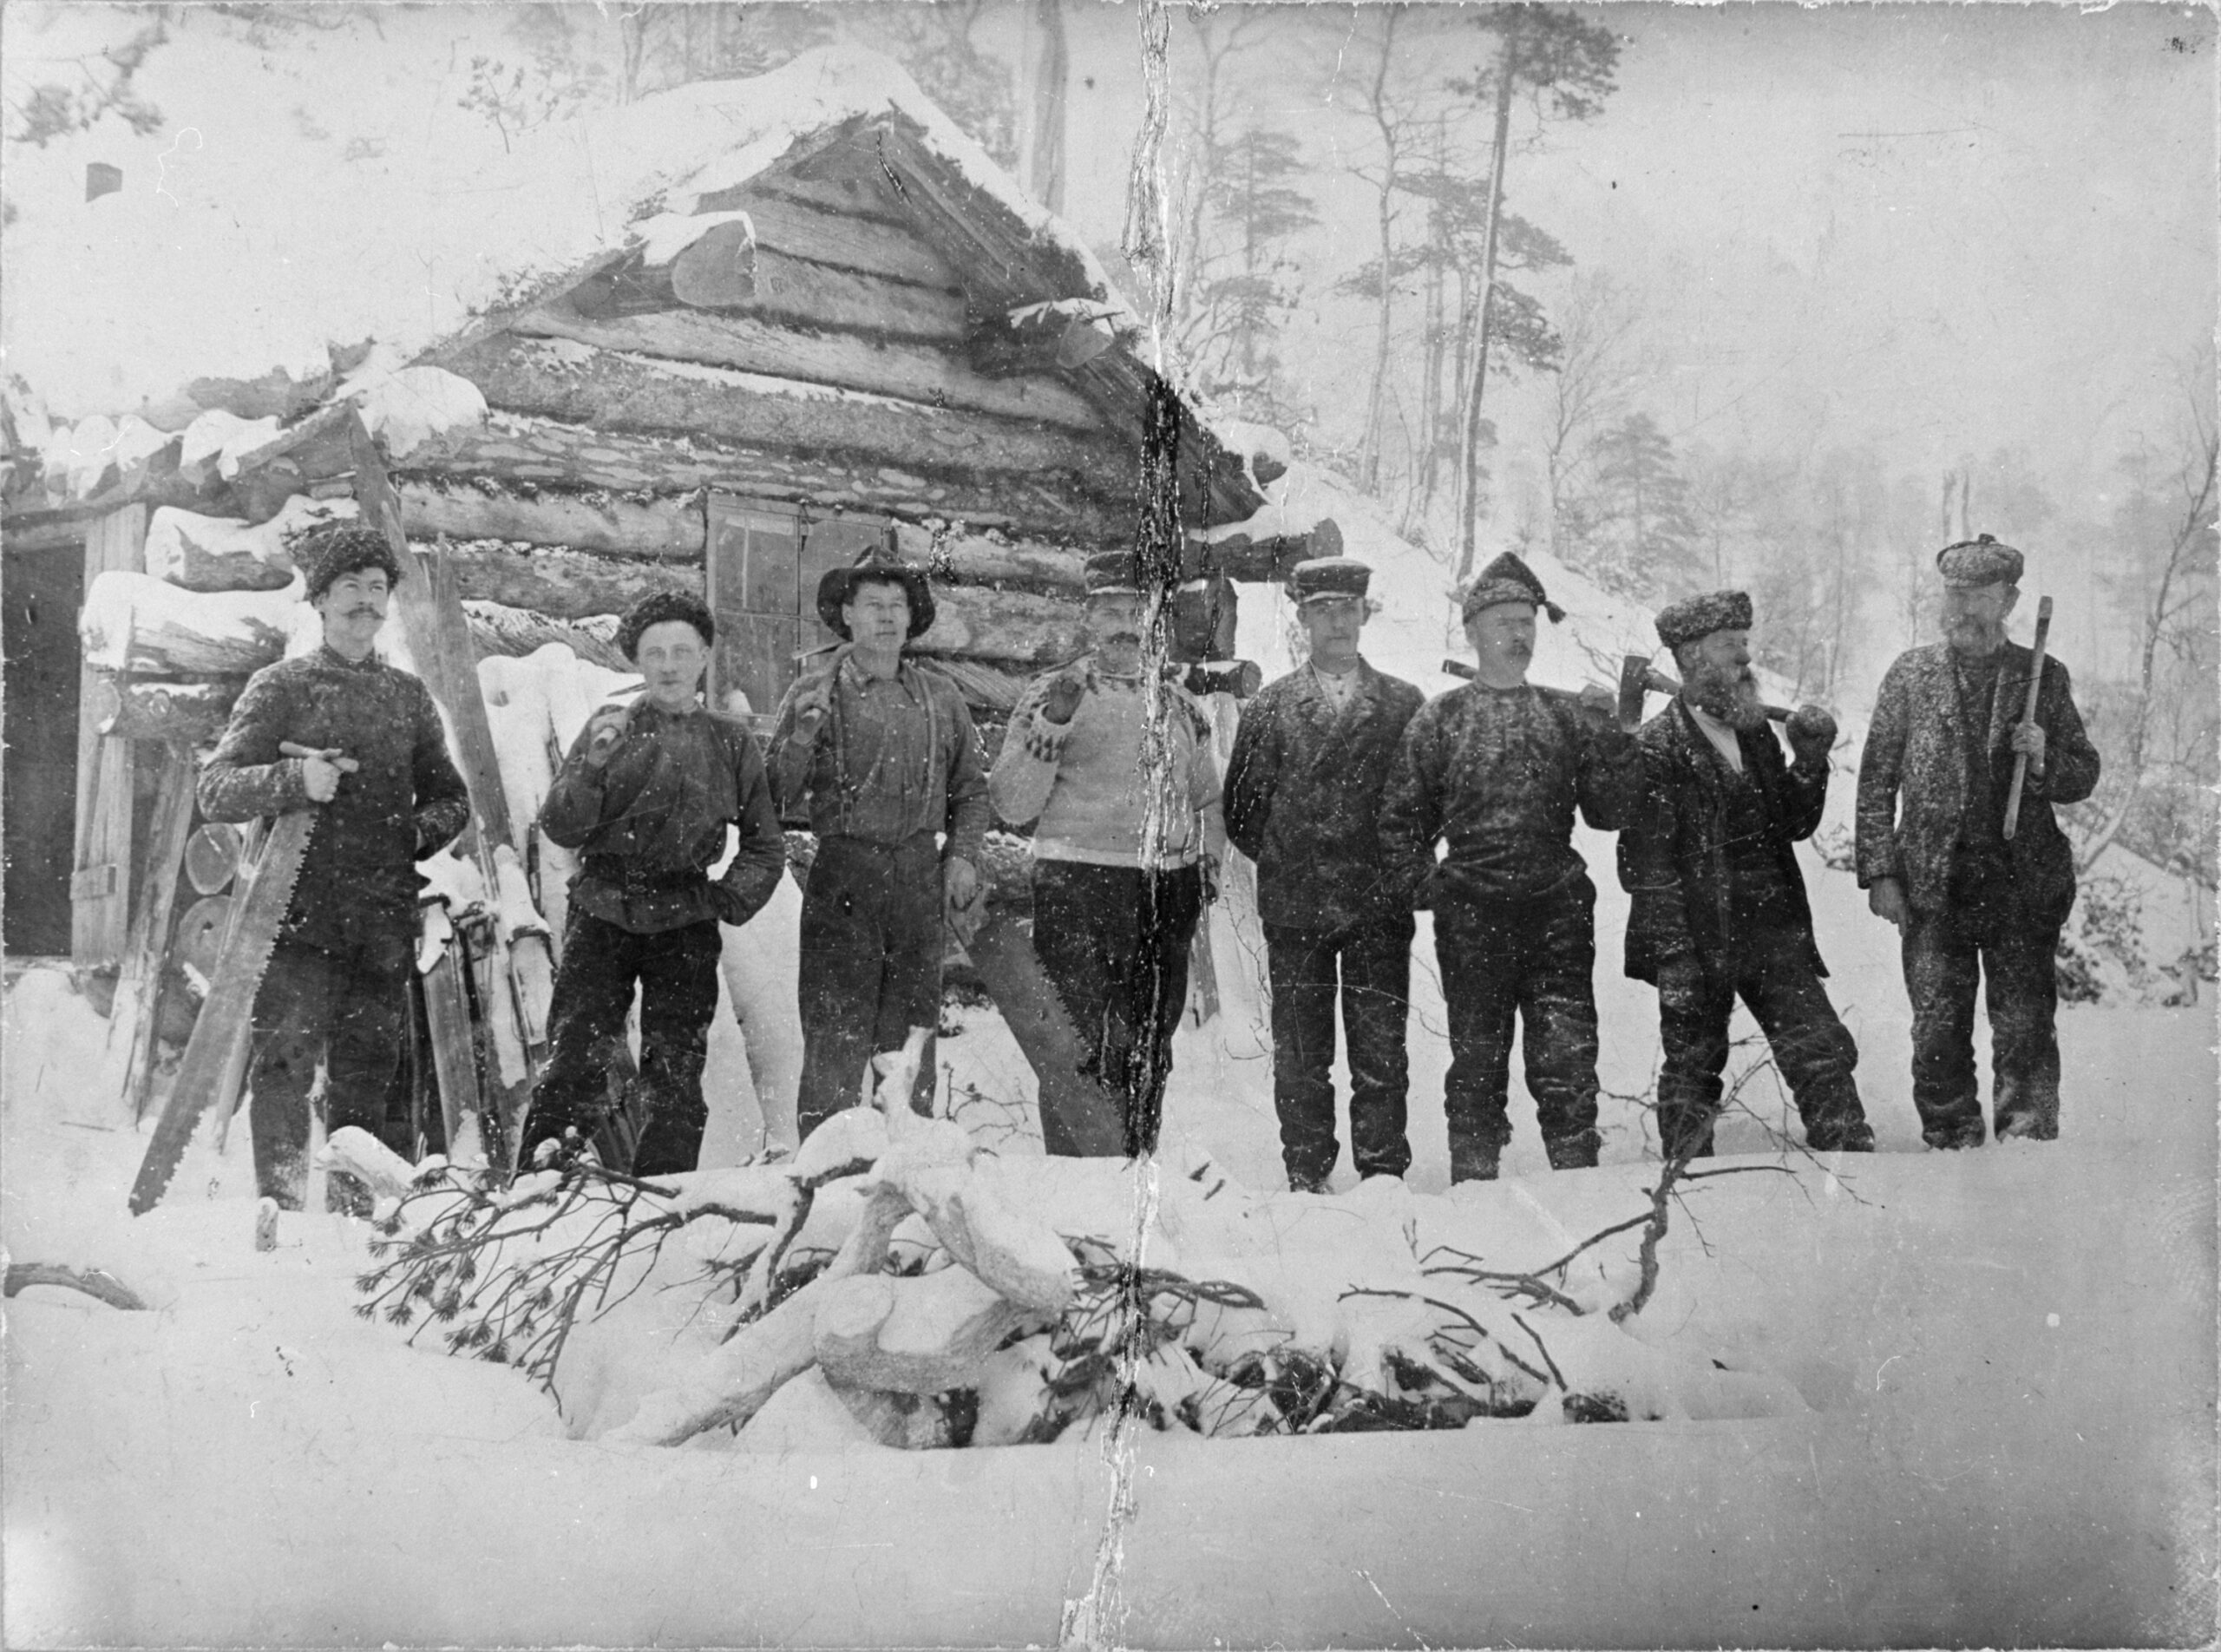 Åtte menn med sag og økser fremfor skogsstue i snø.